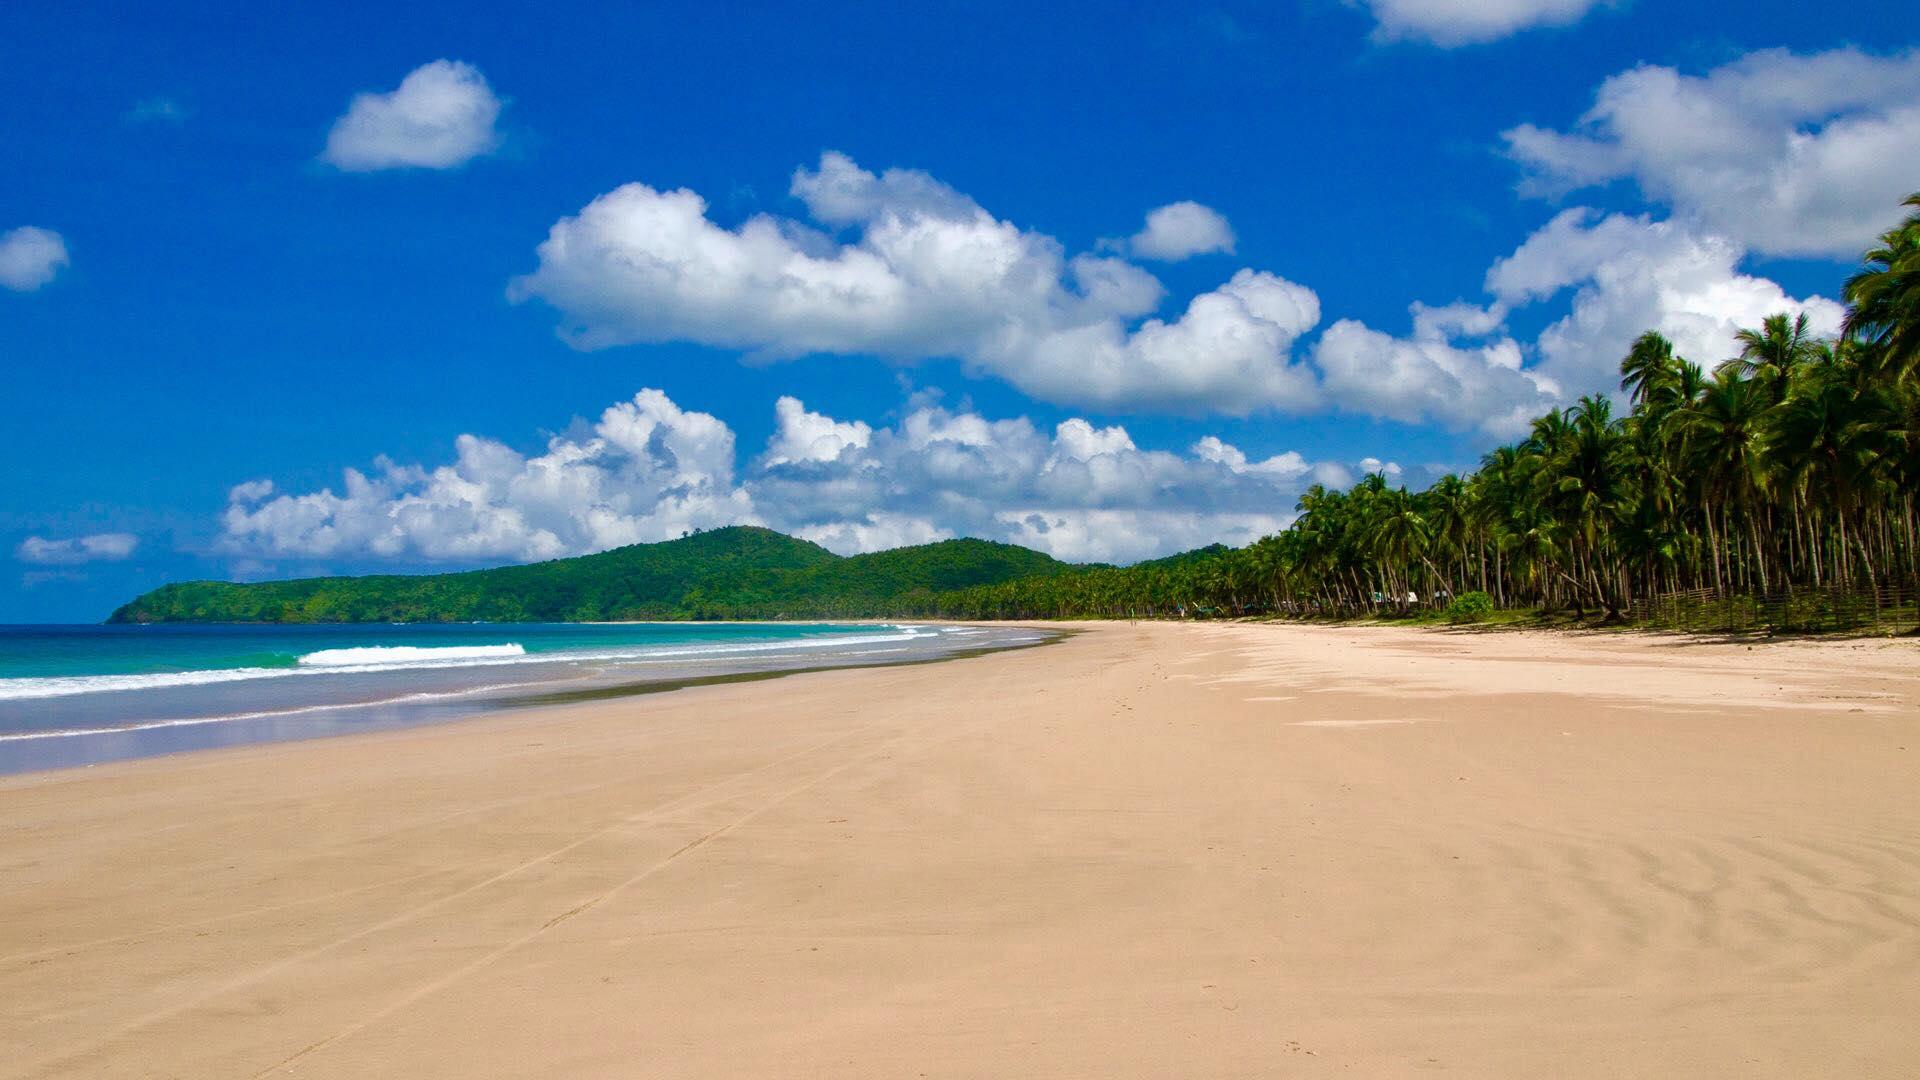 Top Beaches in Asia 2020